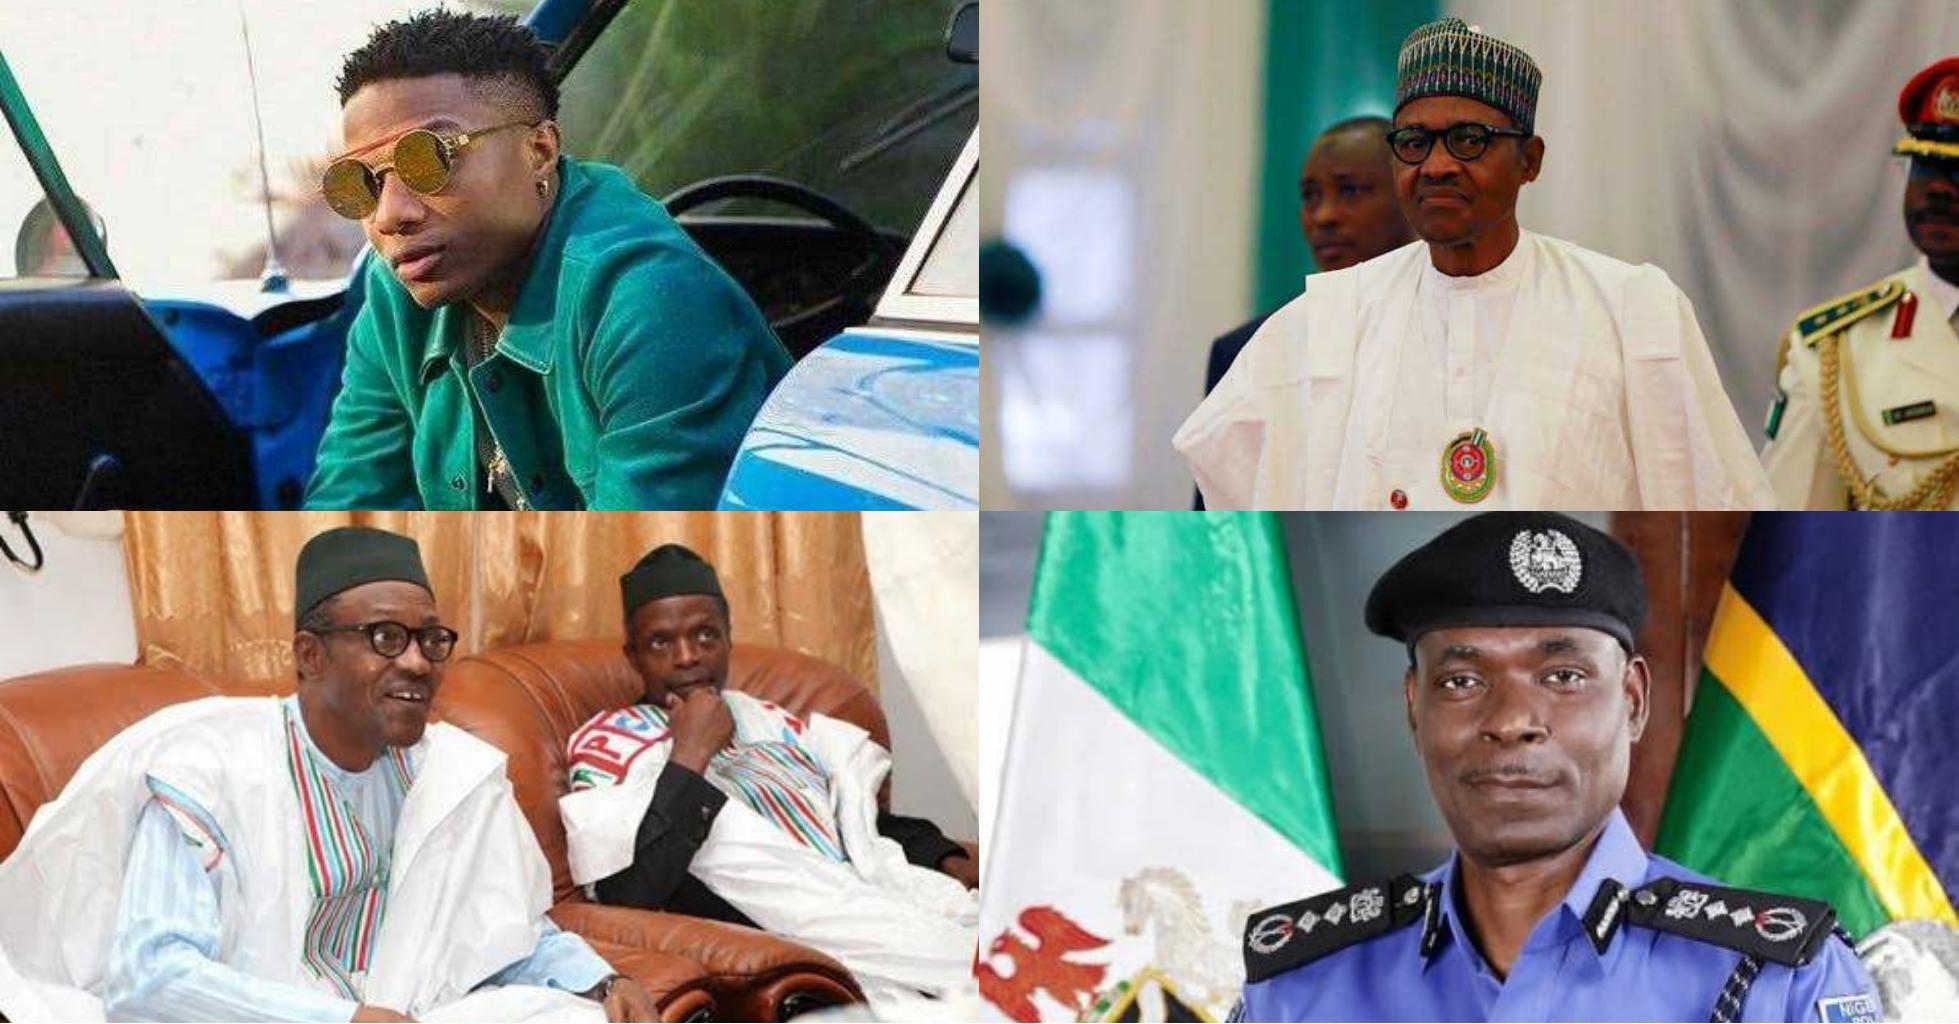 You are a failure! You should resign – Wizkid tells Buhari